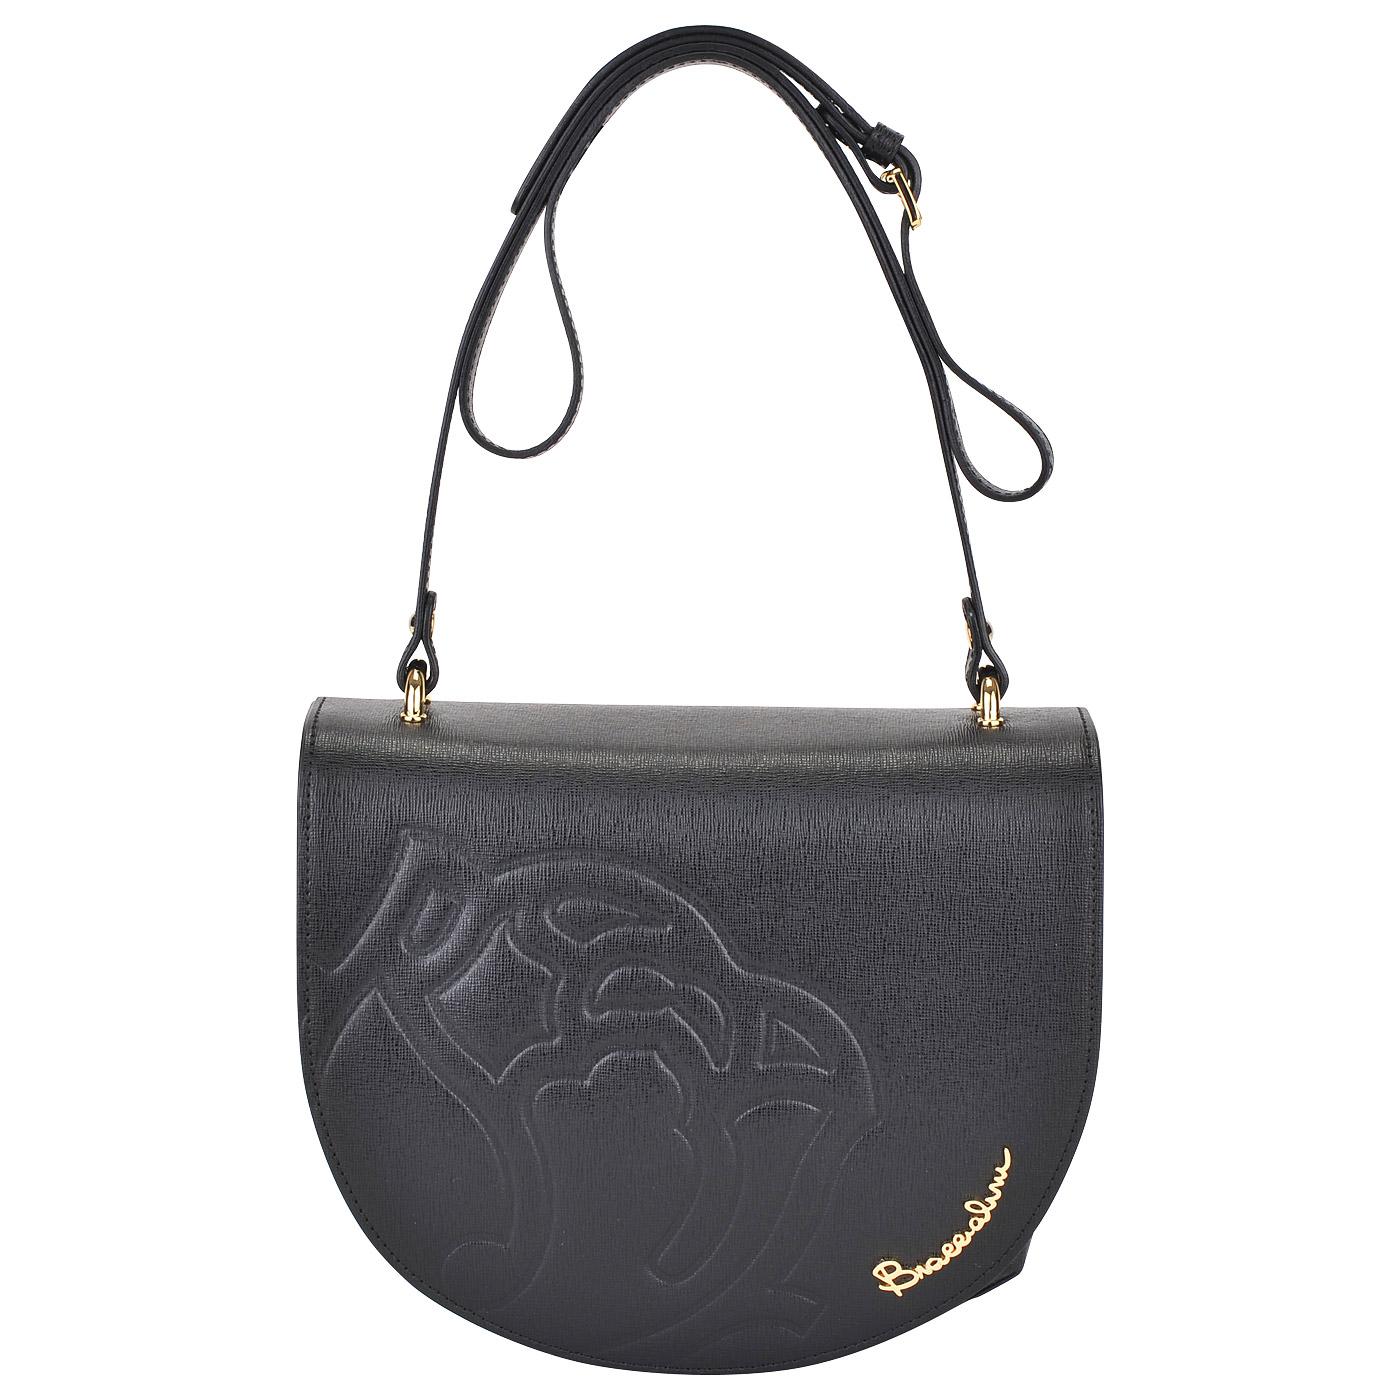 454572814e93 Женская кожаная сумка через плечо Braccialini Ninfea Женская кожаная сумка  через плечо Braccialini Ninfea ...